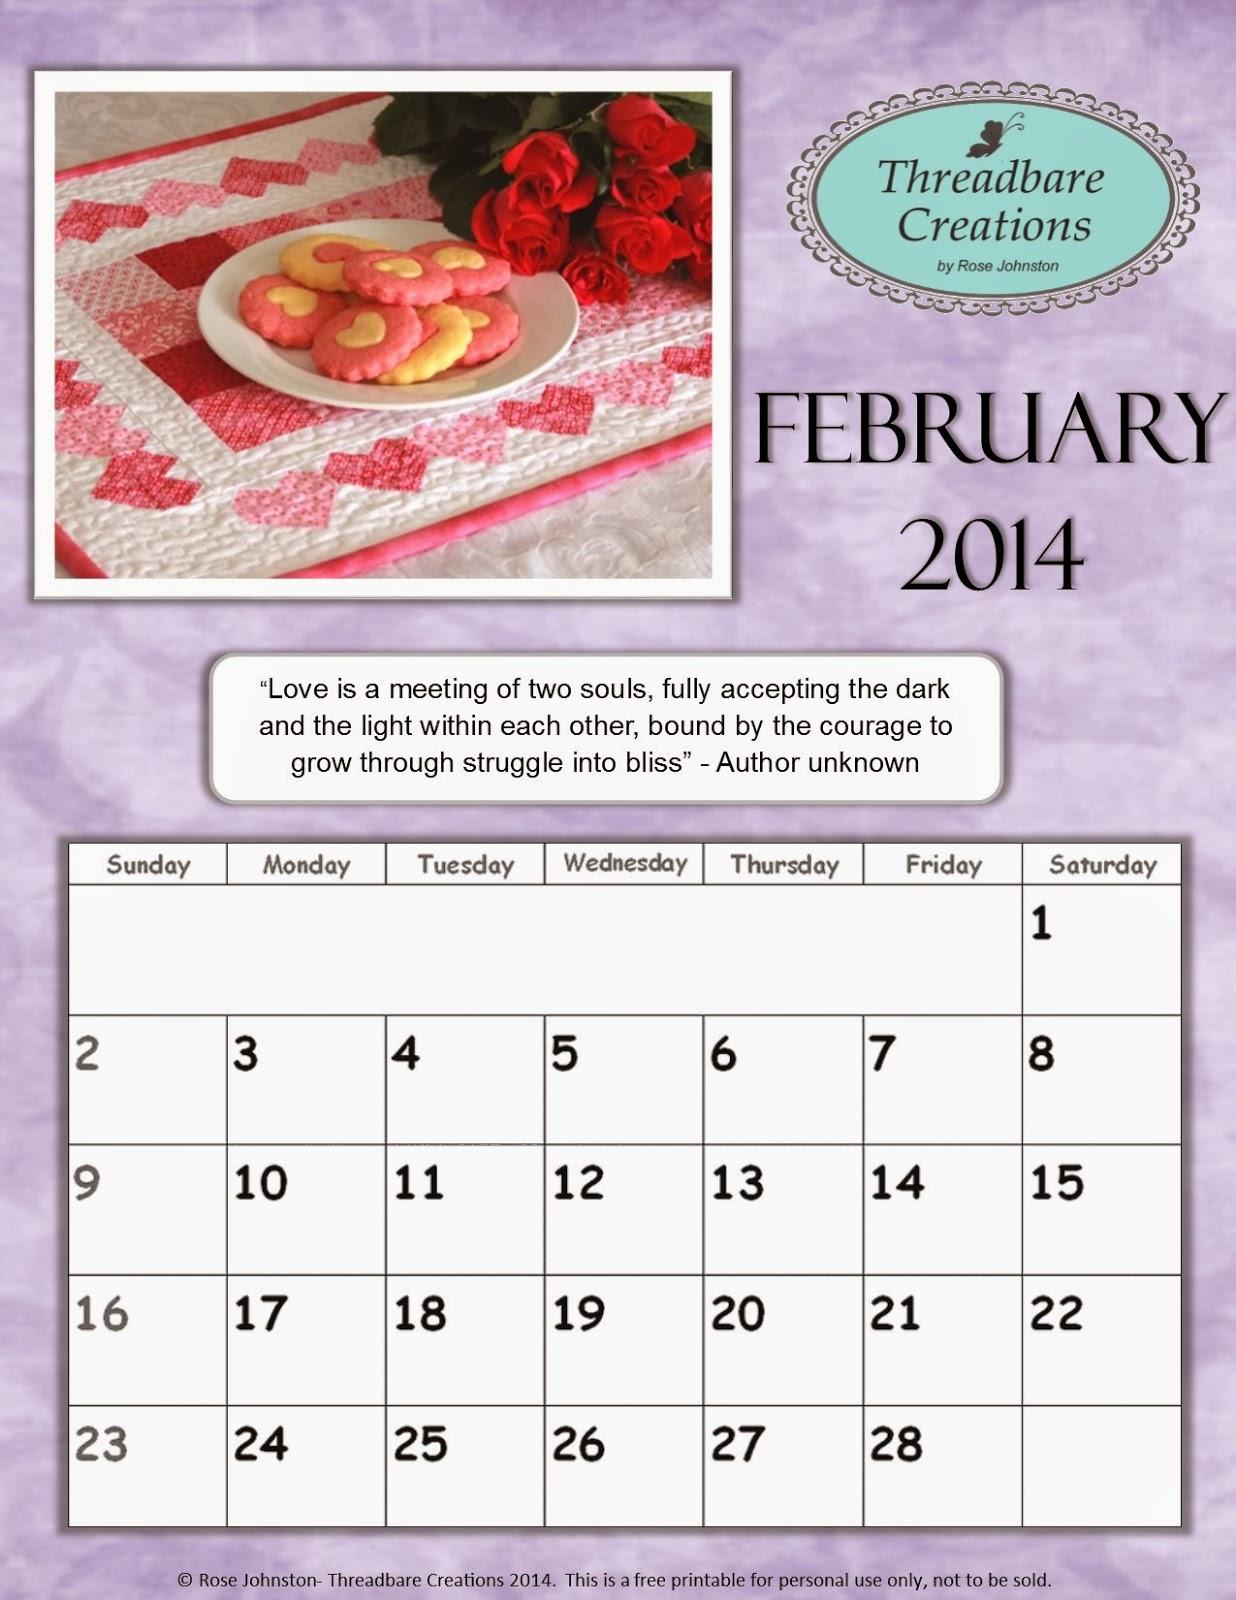 Galleries Related: Cute February 2014 Calendar , March 2014 Calendar ...